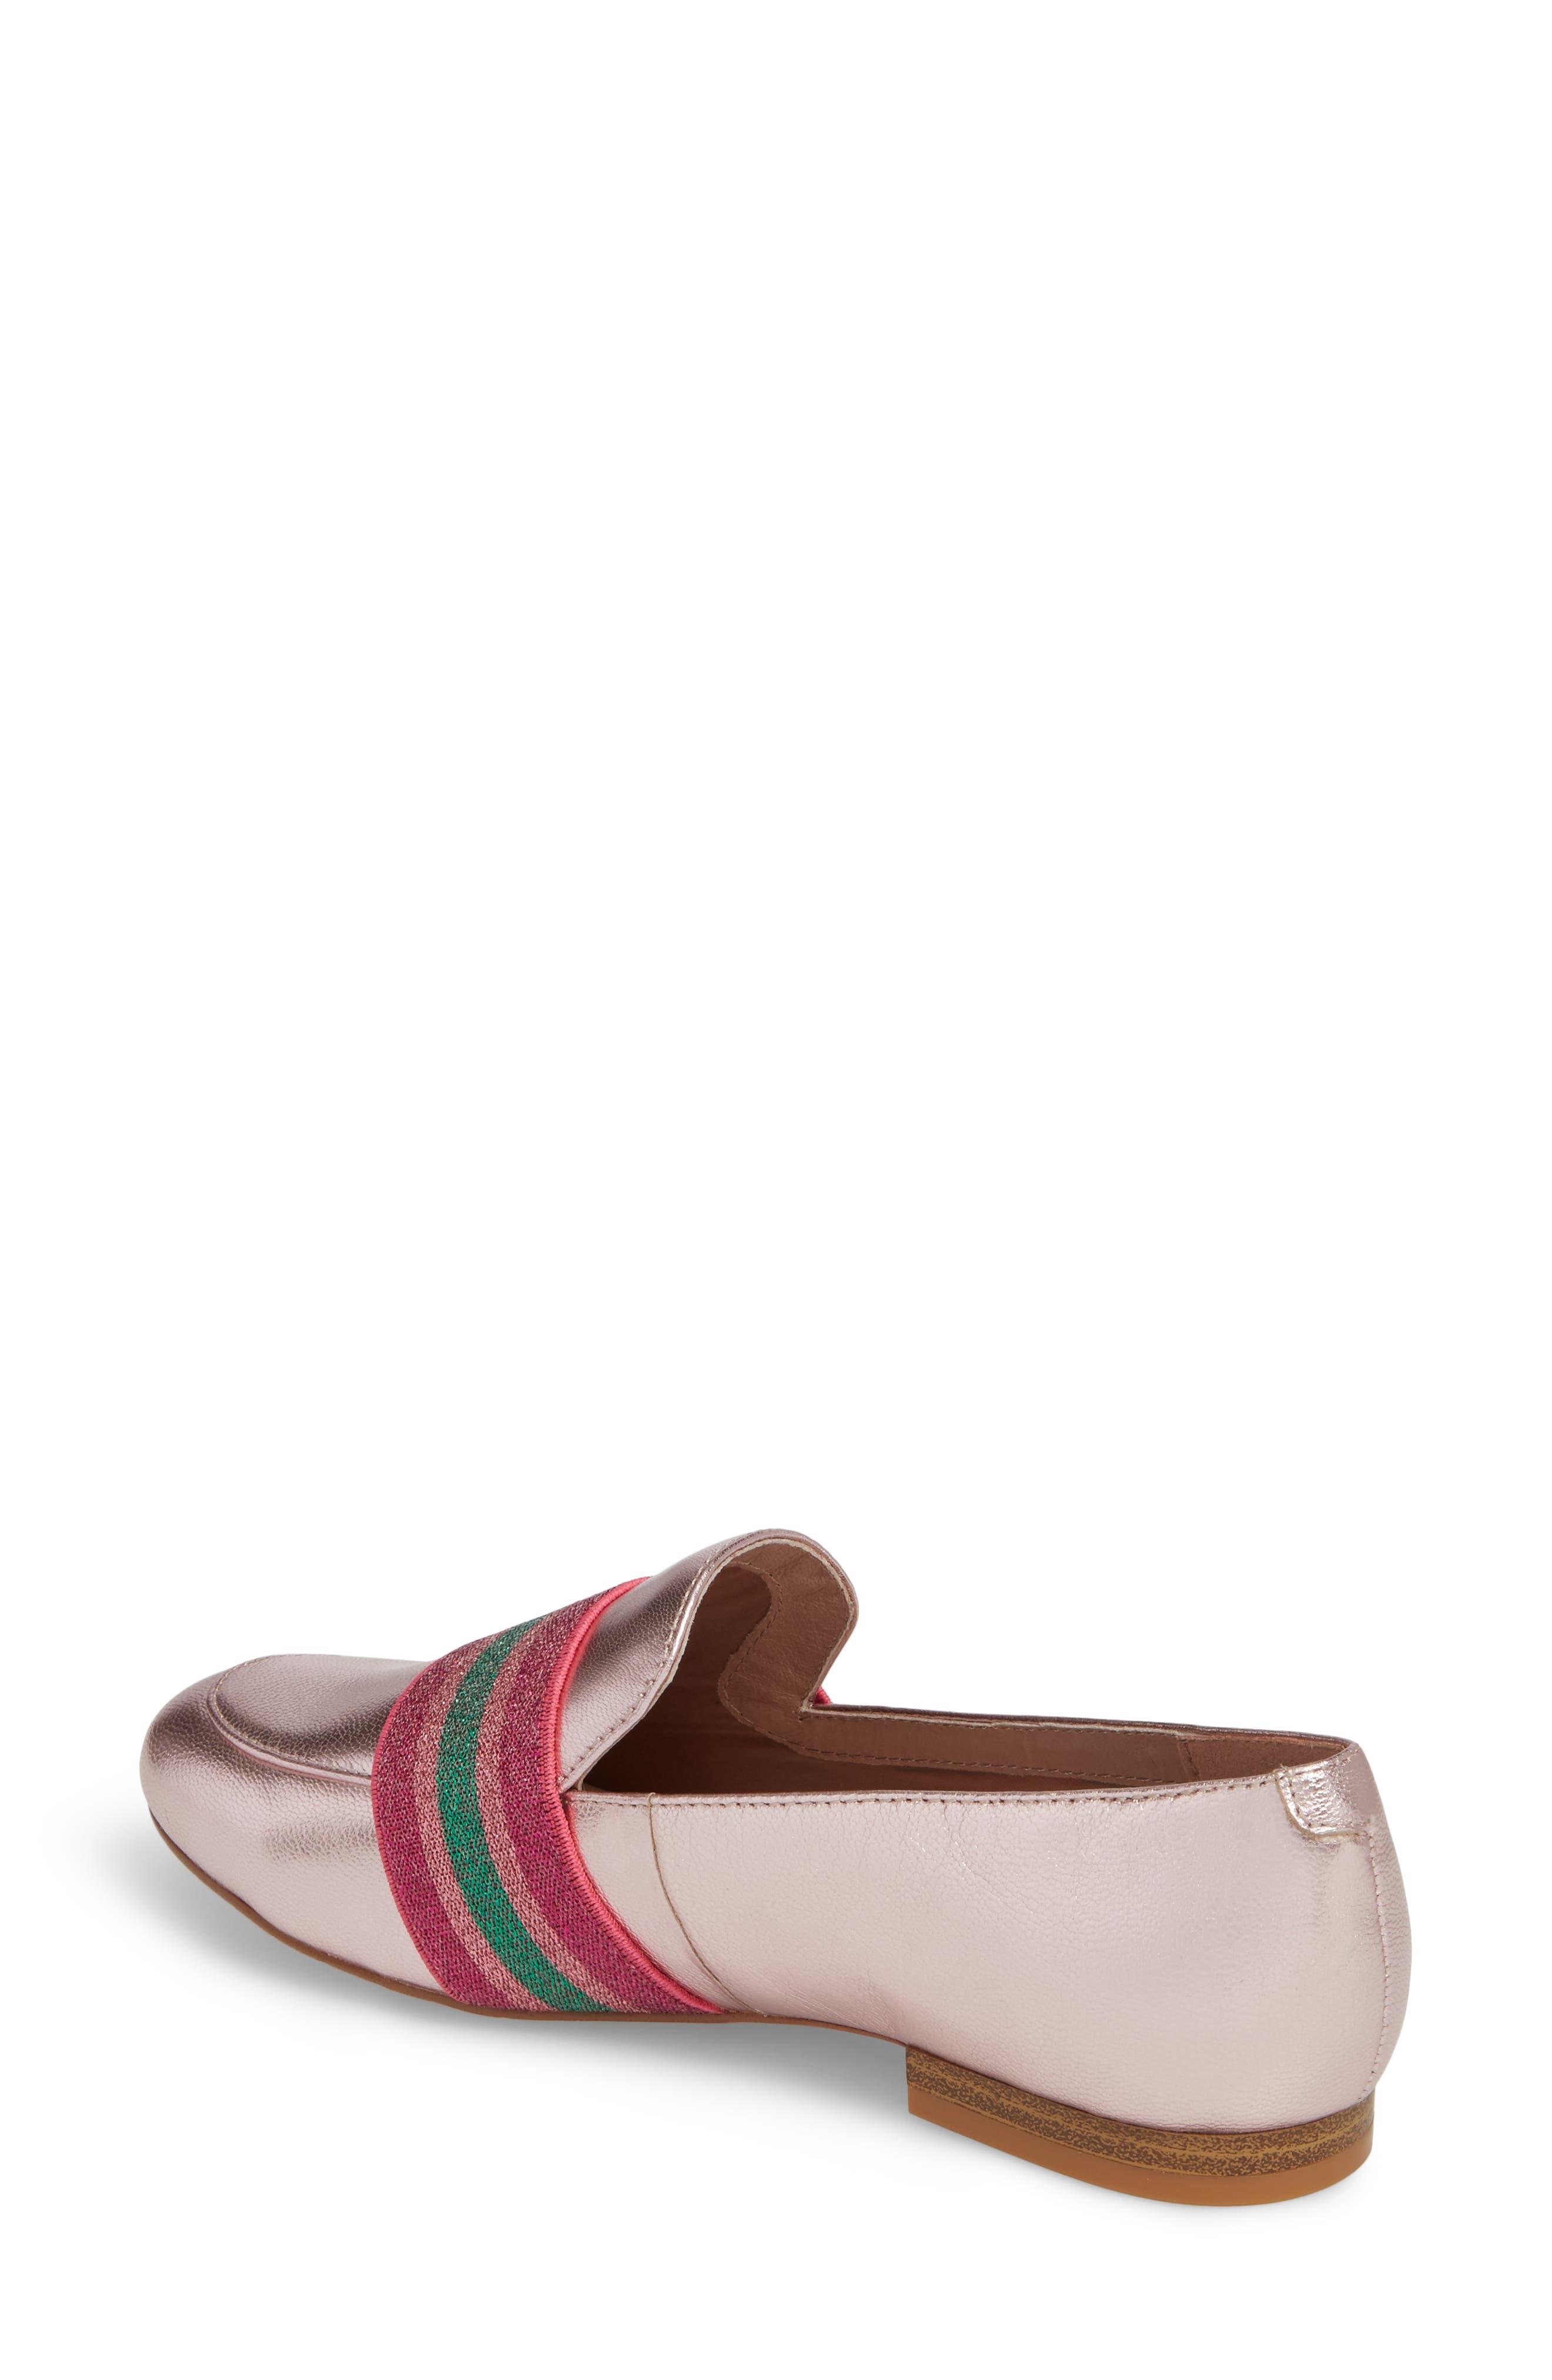 Walden Loafer,                             Alternate thumbnail 2, color,                             Pink Metallic Leather